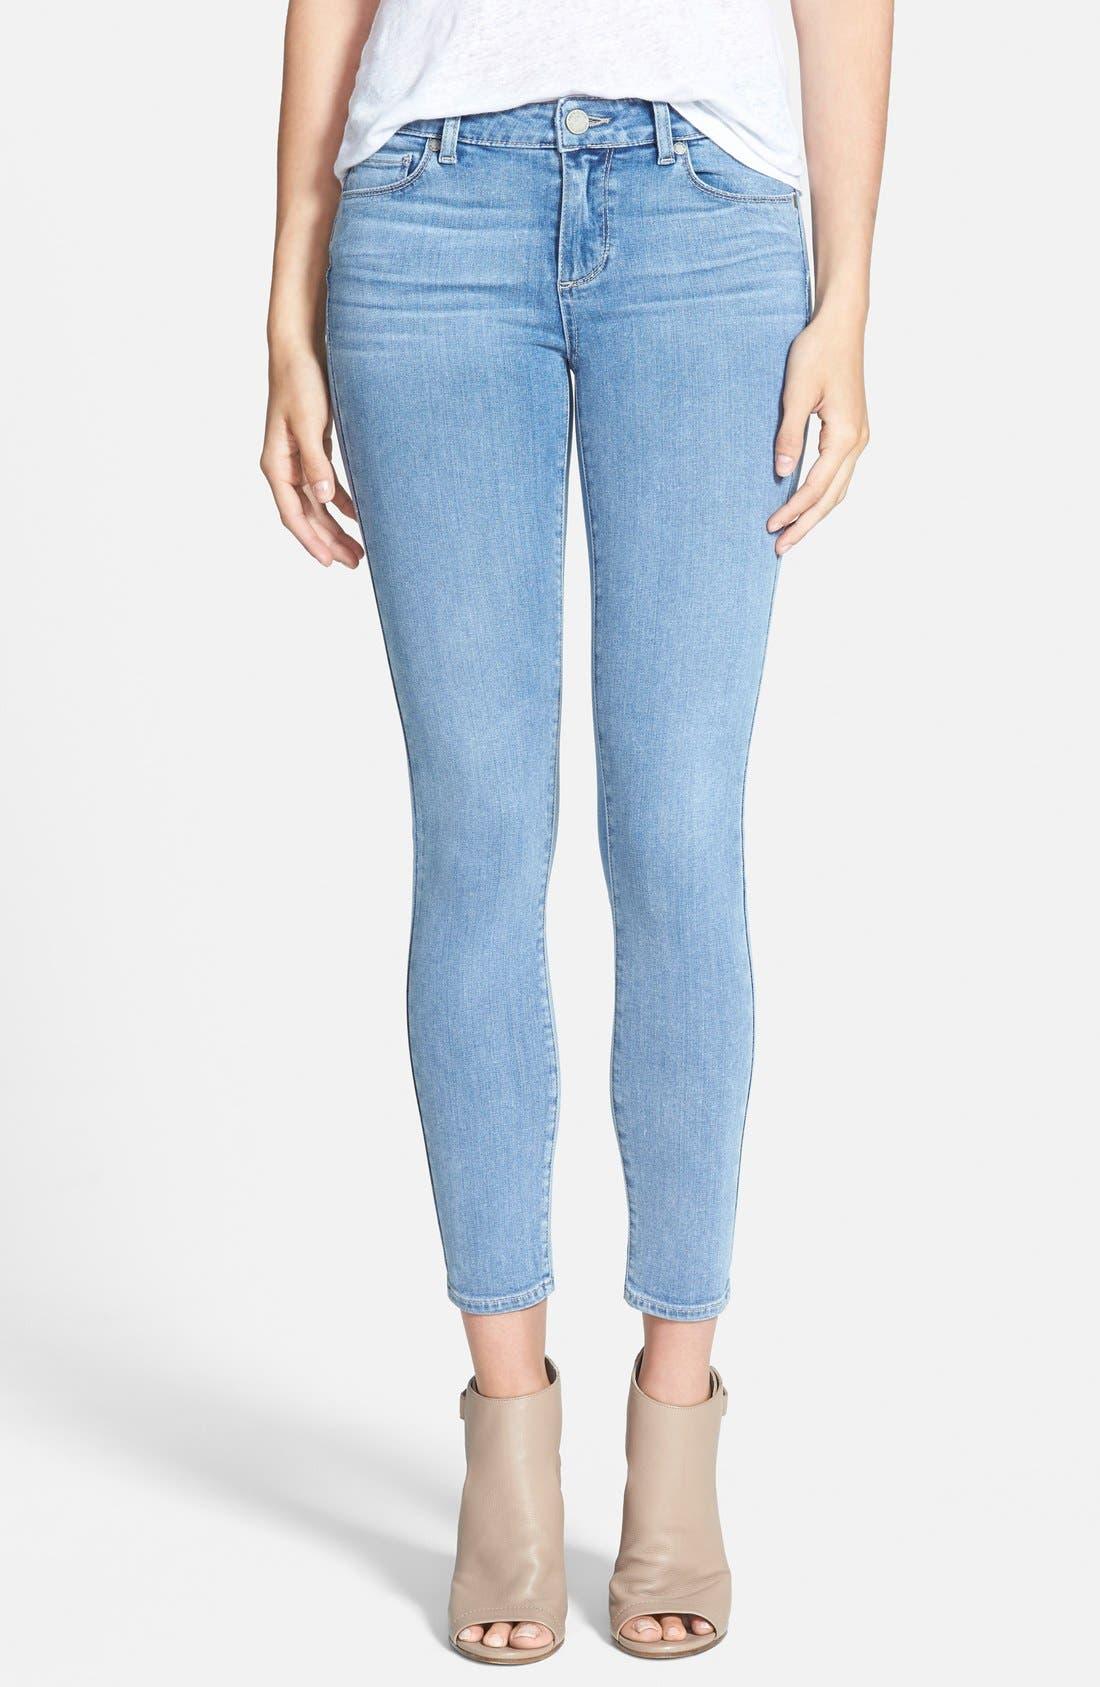 Alternate Image 1 Selected - Paige Denim 'Transcend - Verdugo' Ankle Ultra Skinny Jeans (Joelle)